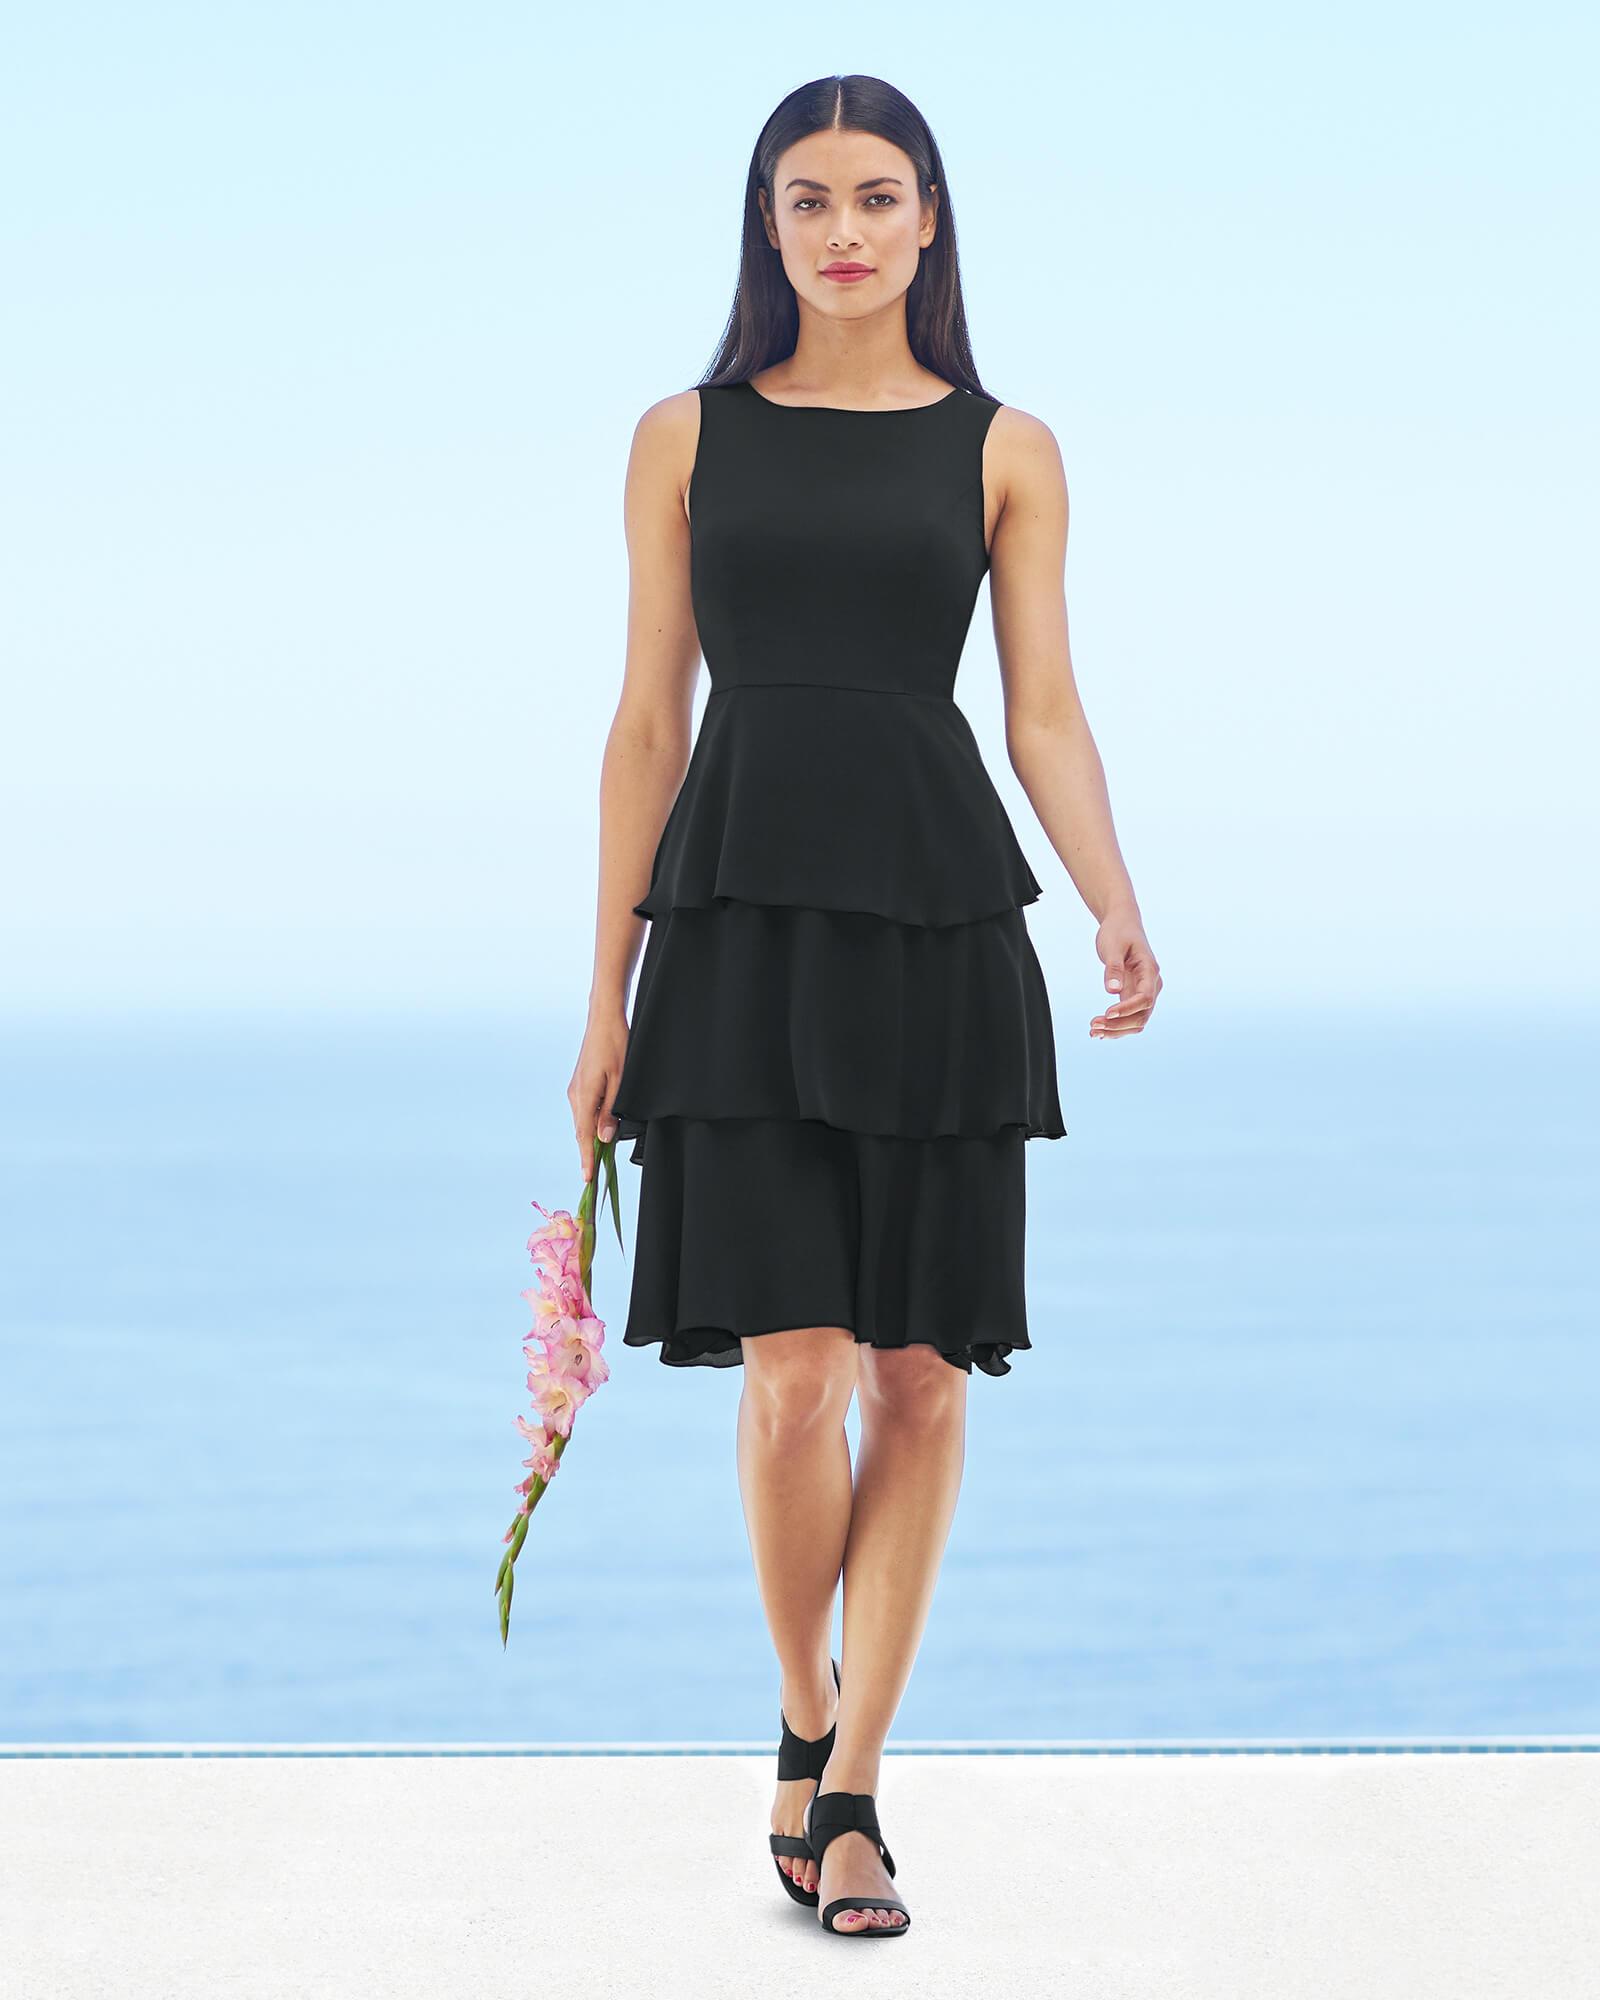 Get 25+ Schwarzes Kleid Mit Jeansjacke Kombinieren